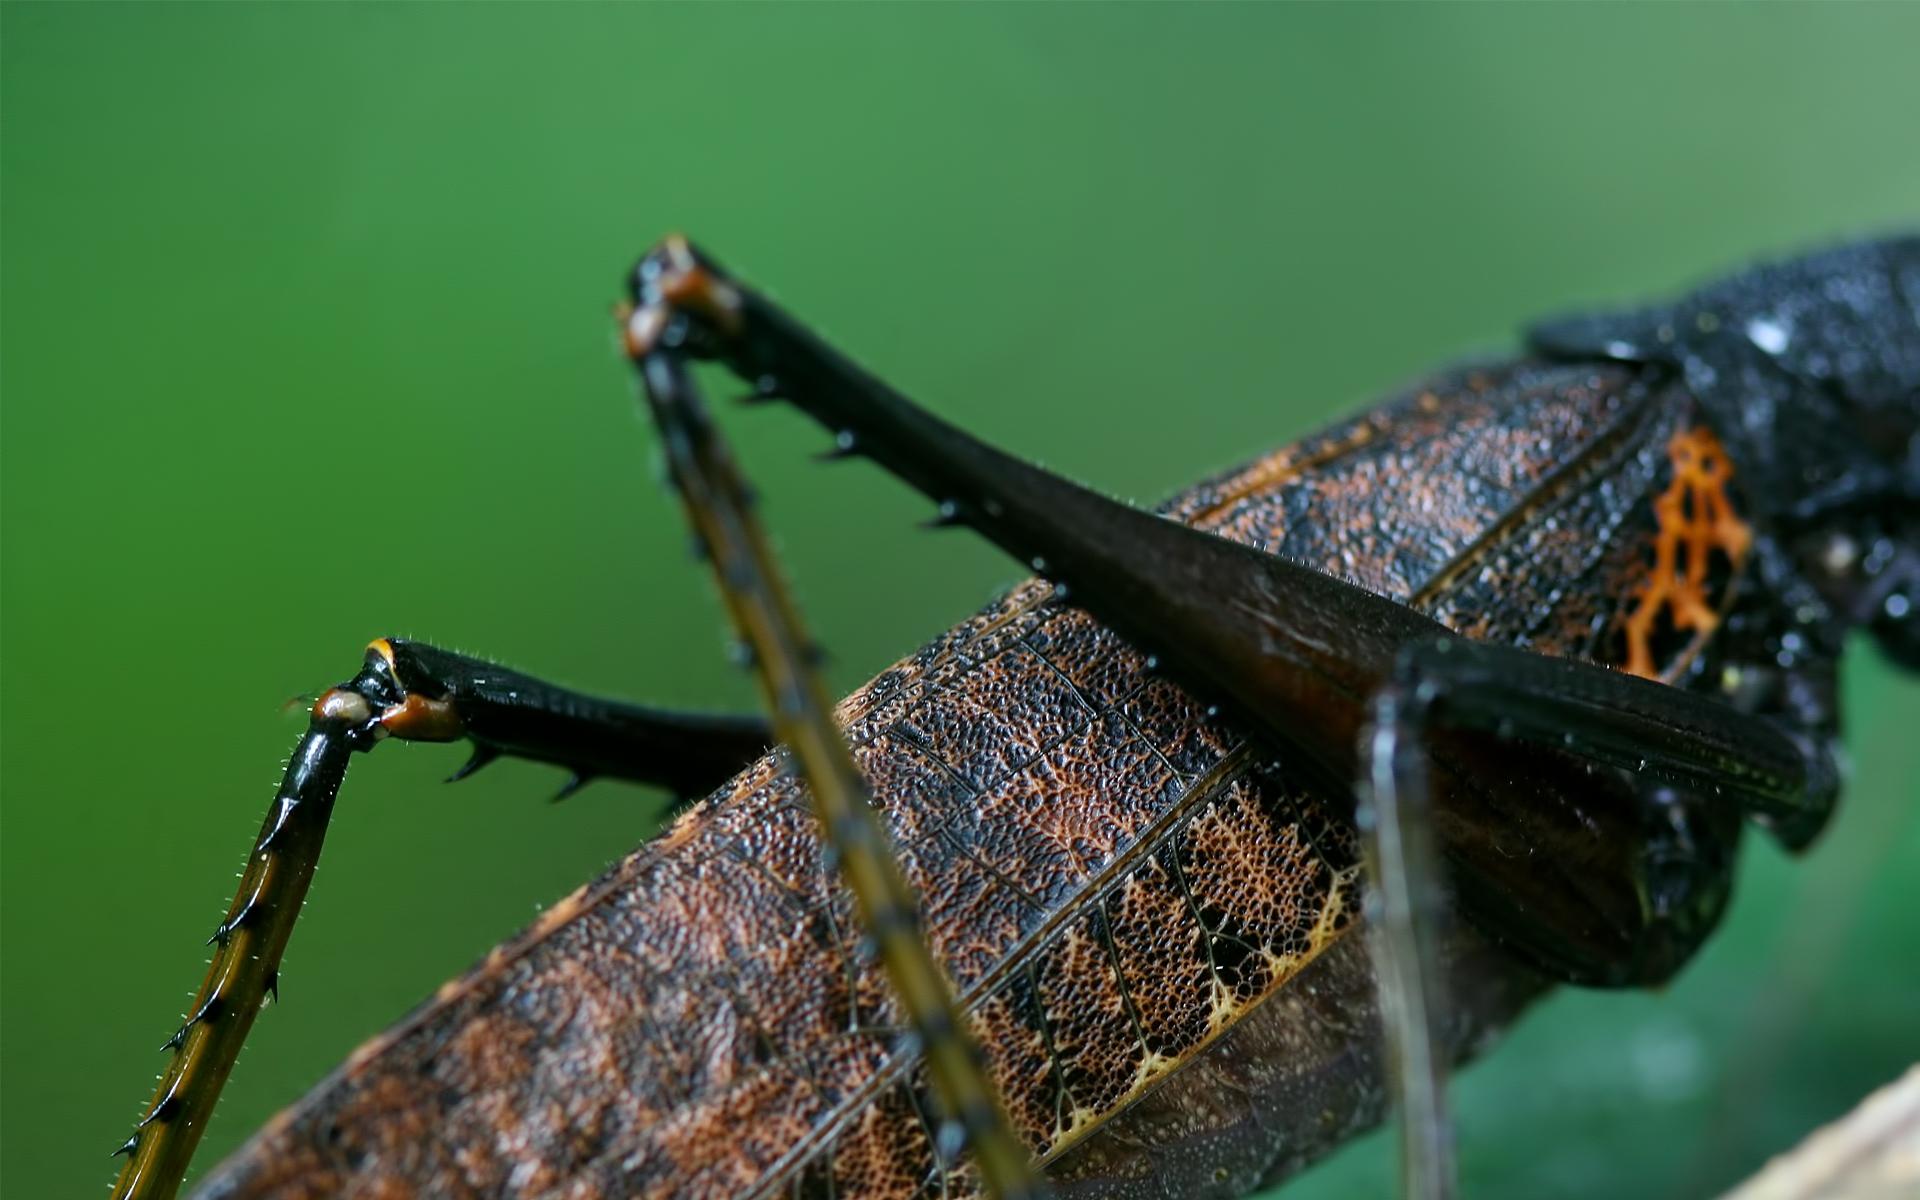 Картинки Кузнечик, ноги, туловище, насекомое фото и обои на рабочий стол